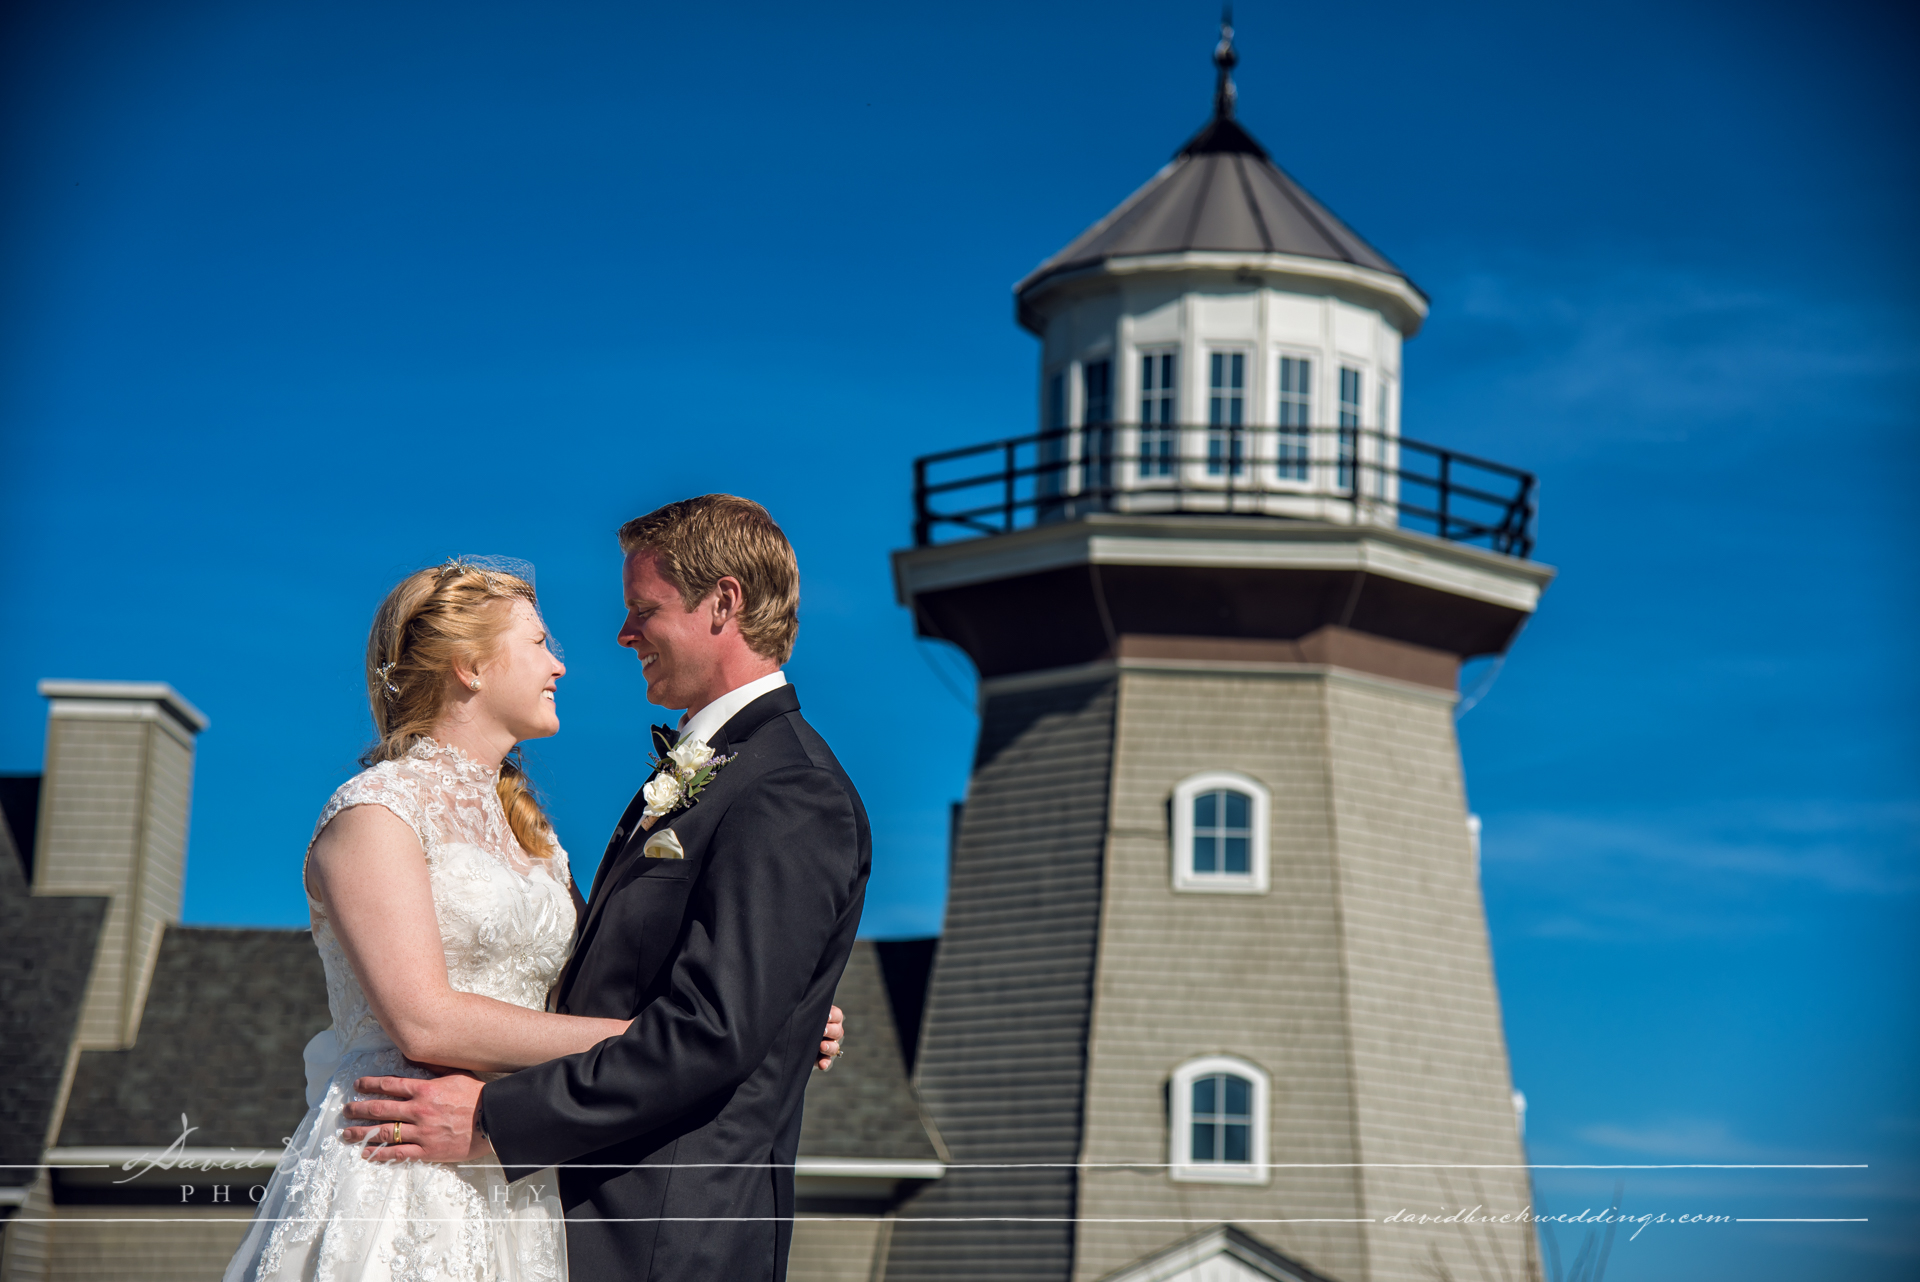 Cobble_Beach_Wedding_Photography_01